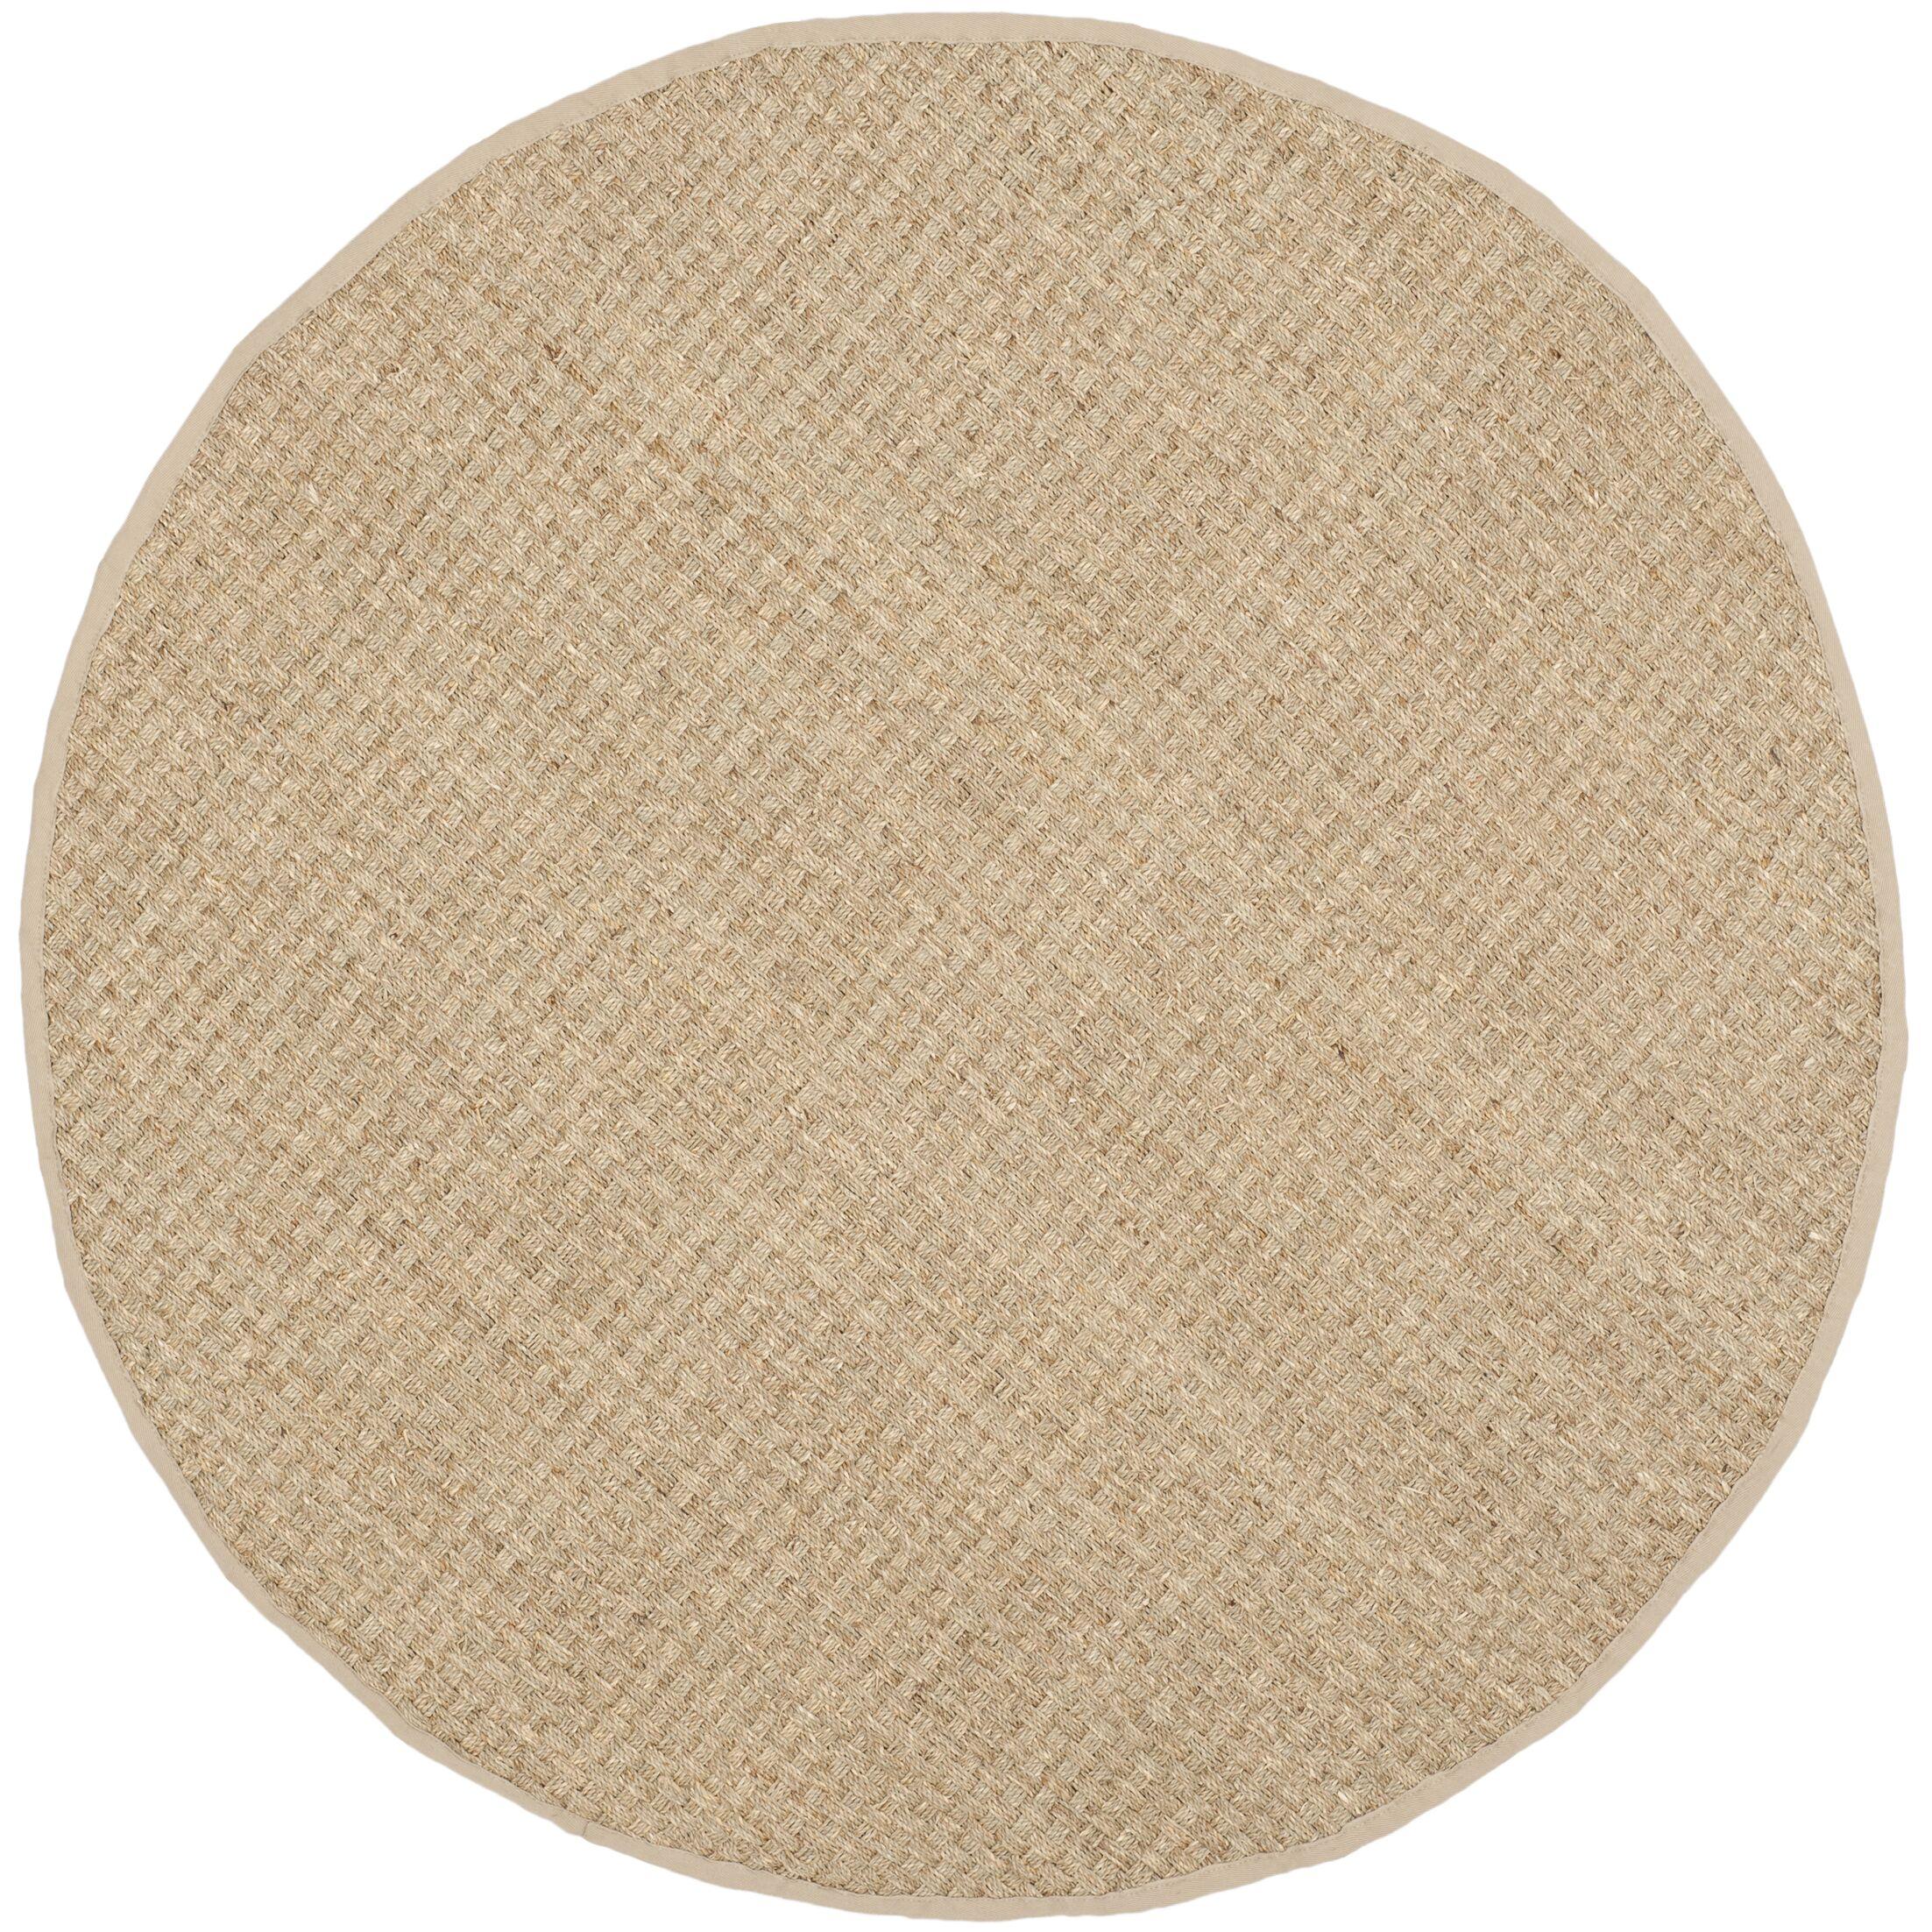 Richmond Hand-Woven Natural/Beige Area Rug Rug Size: Round 6'